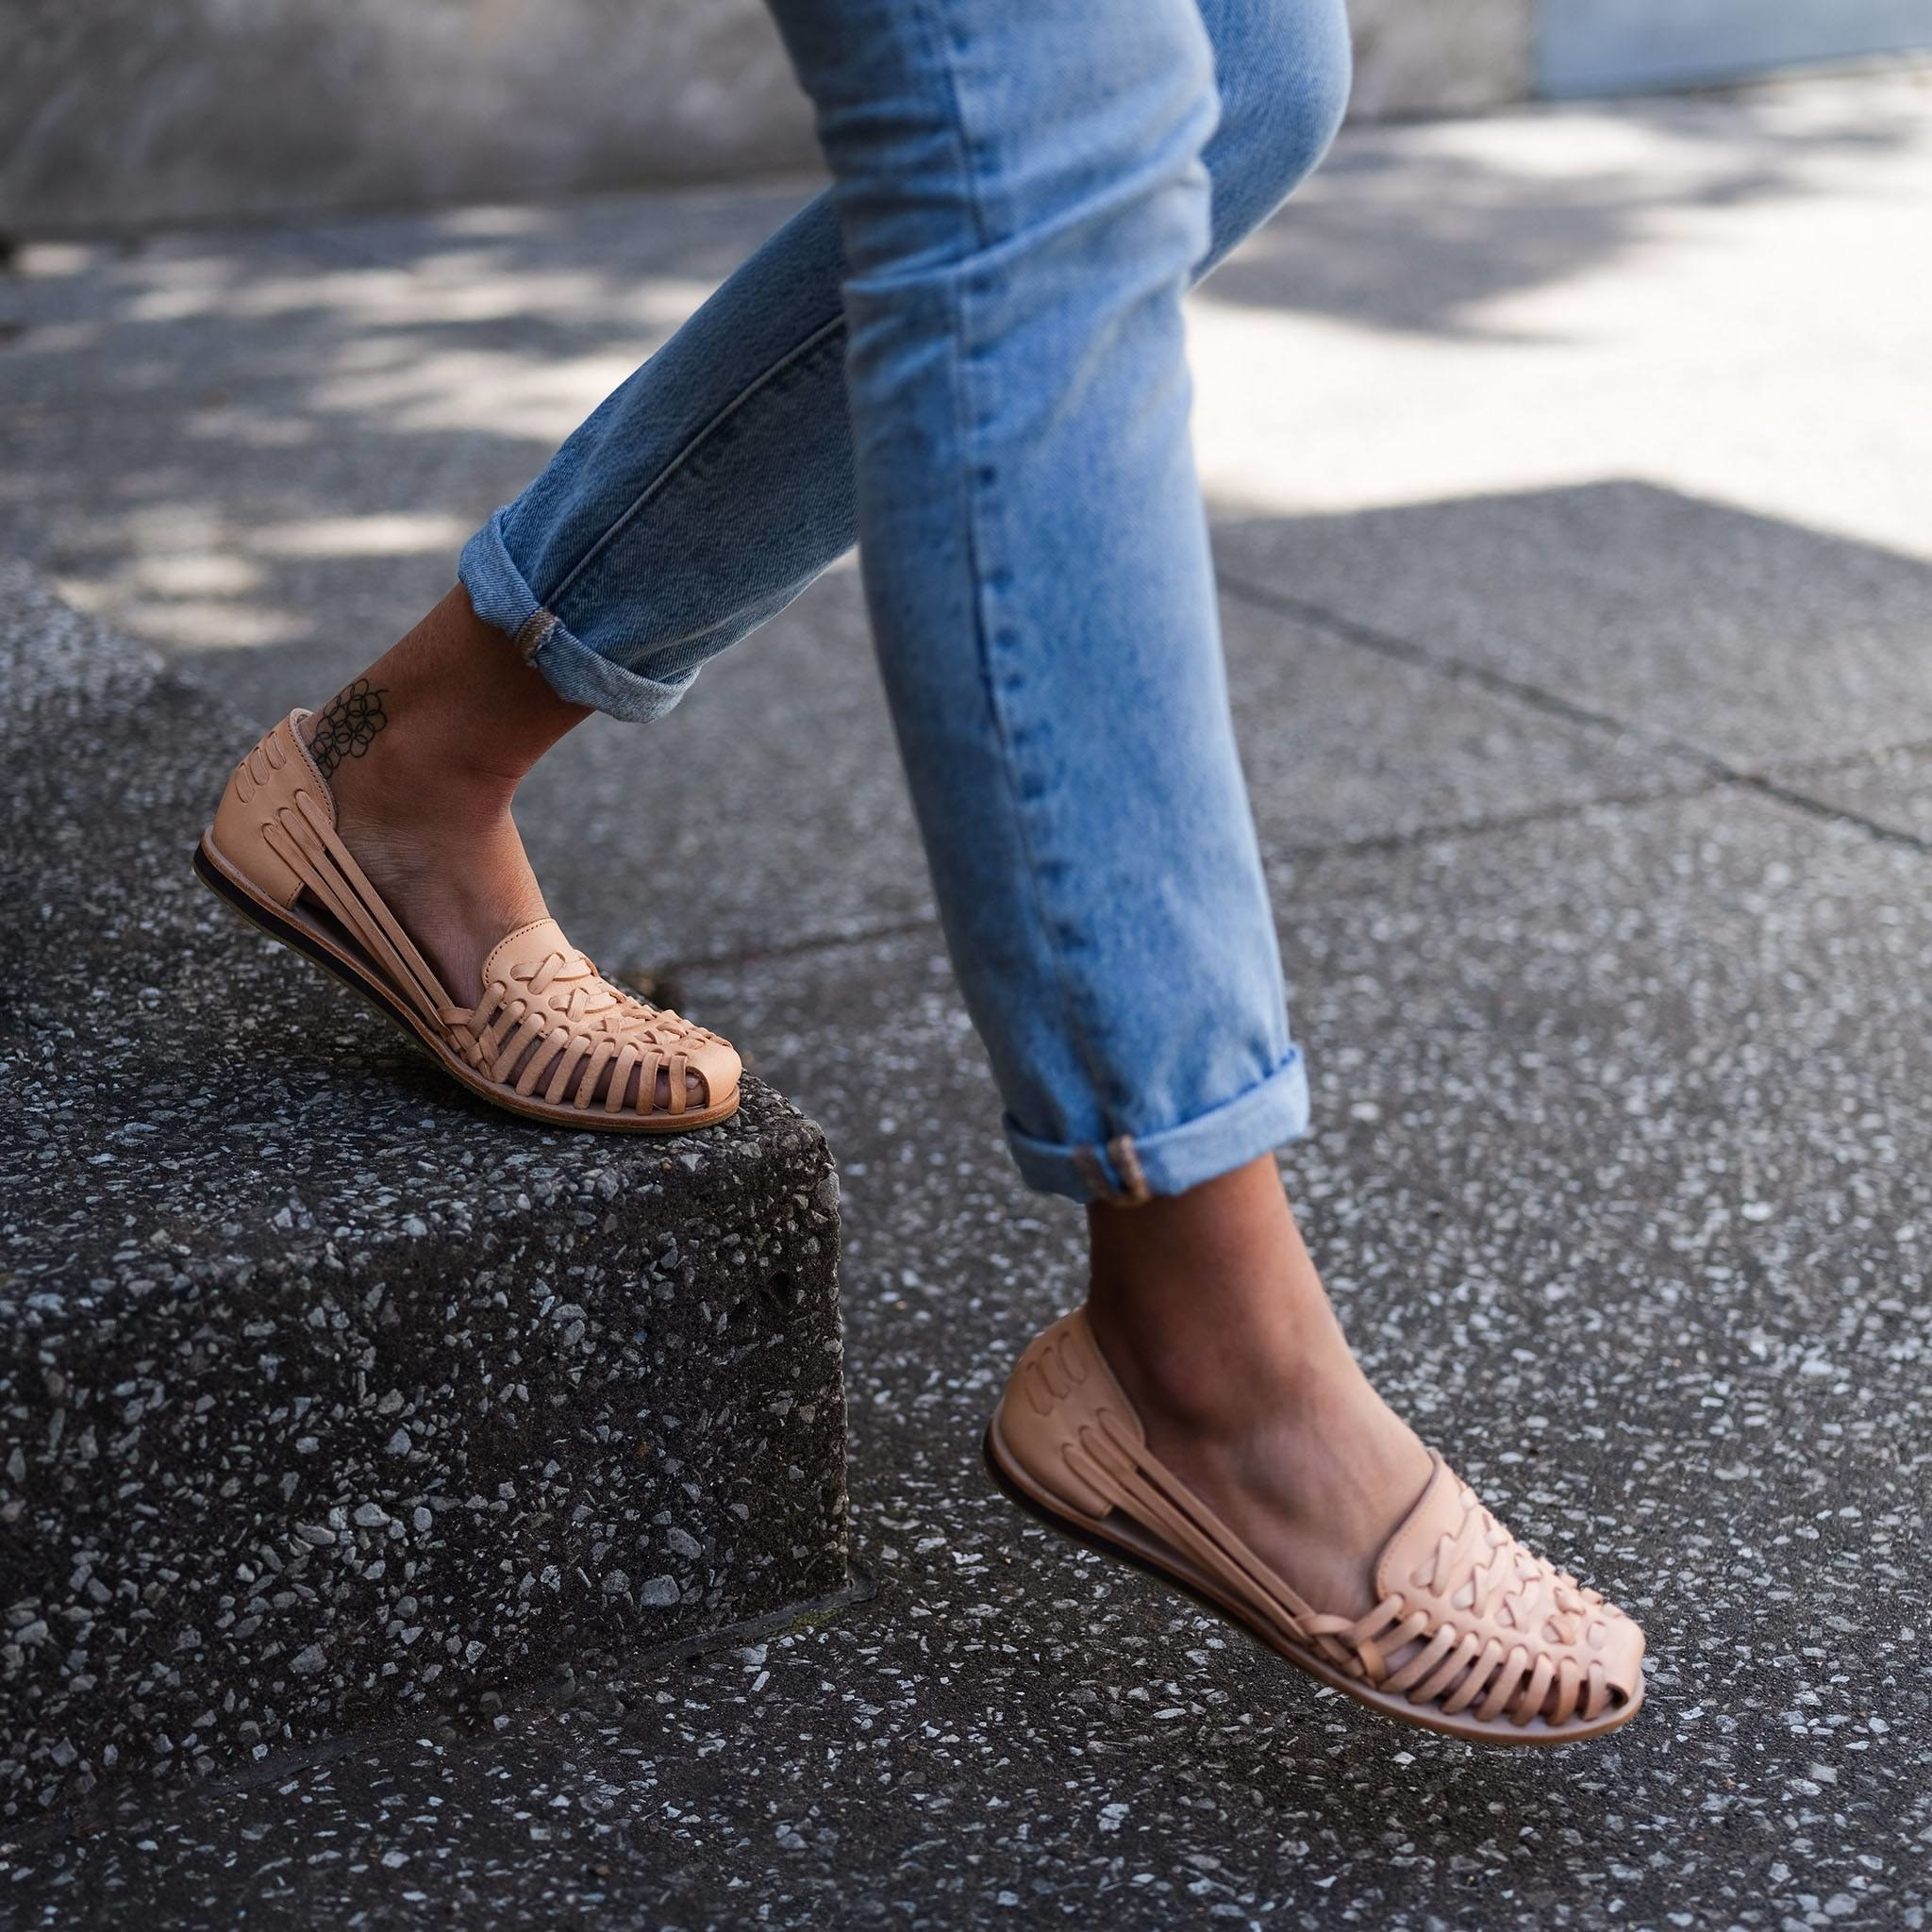 Model wearing sandals while walking on sidewalk